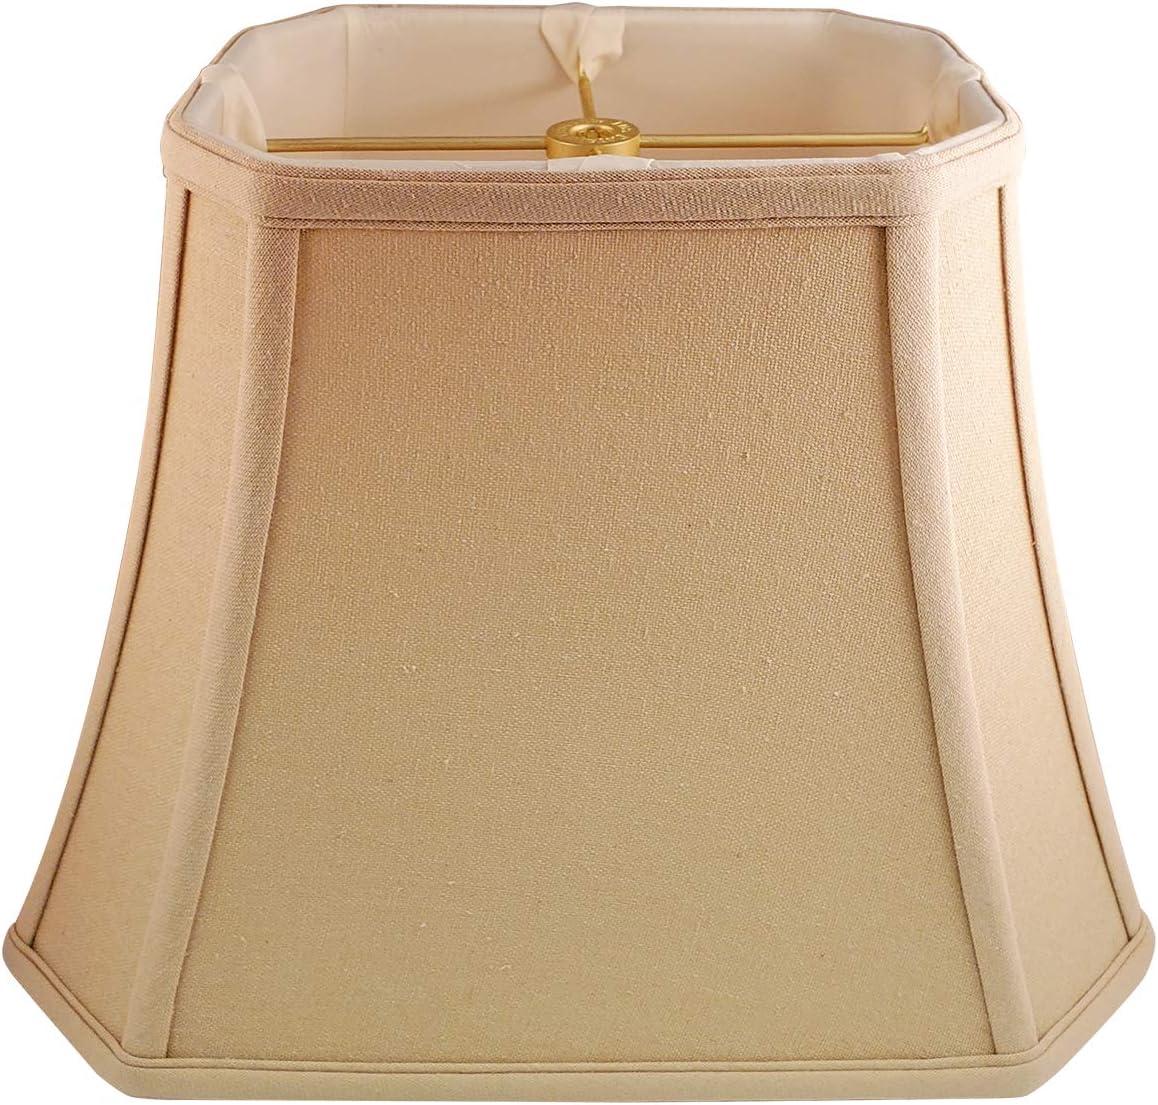 Royal Designs Very popular Rectangle Cut Corner Shade Beige Linen Save money Lamp 5